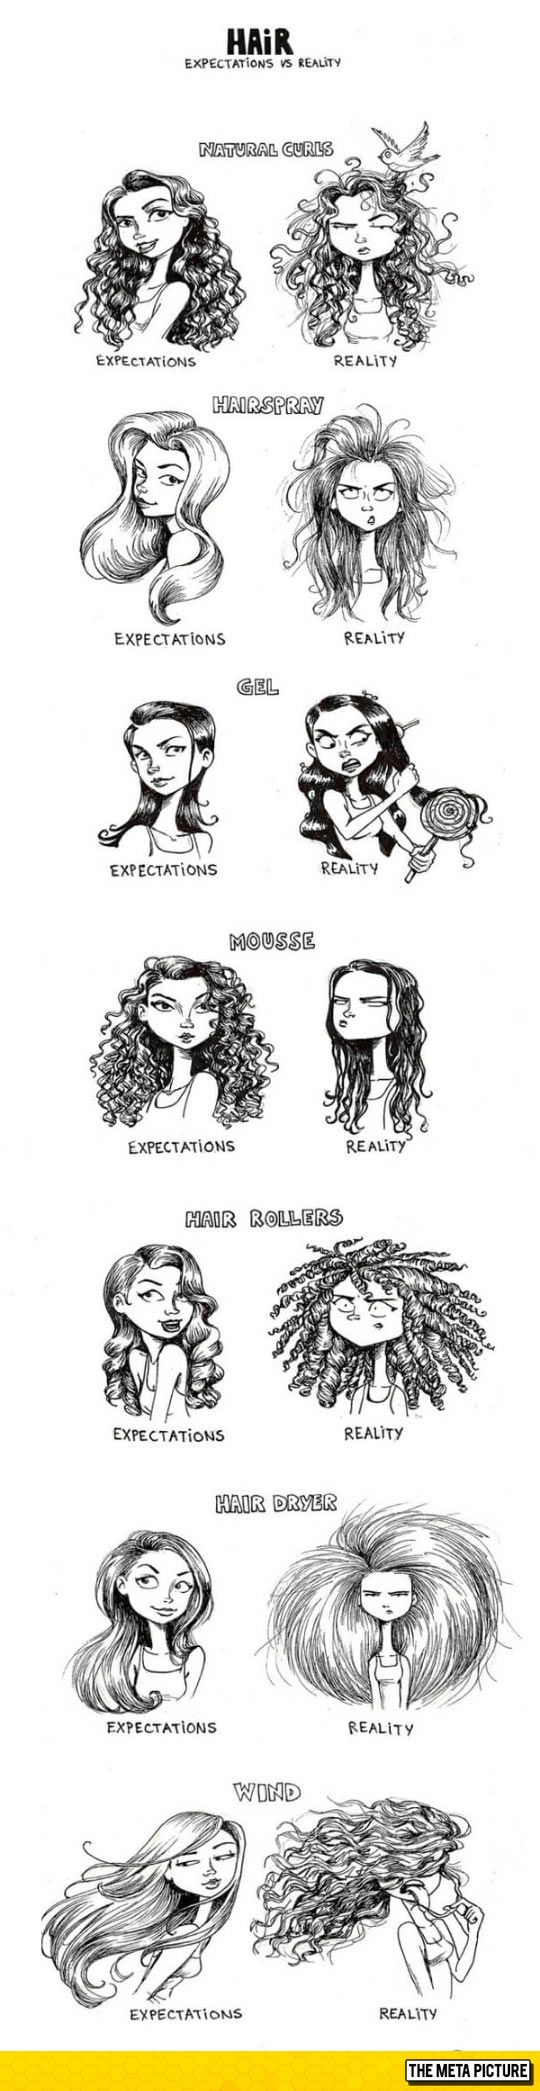 Women's Hair: Expectations Vs. Reality